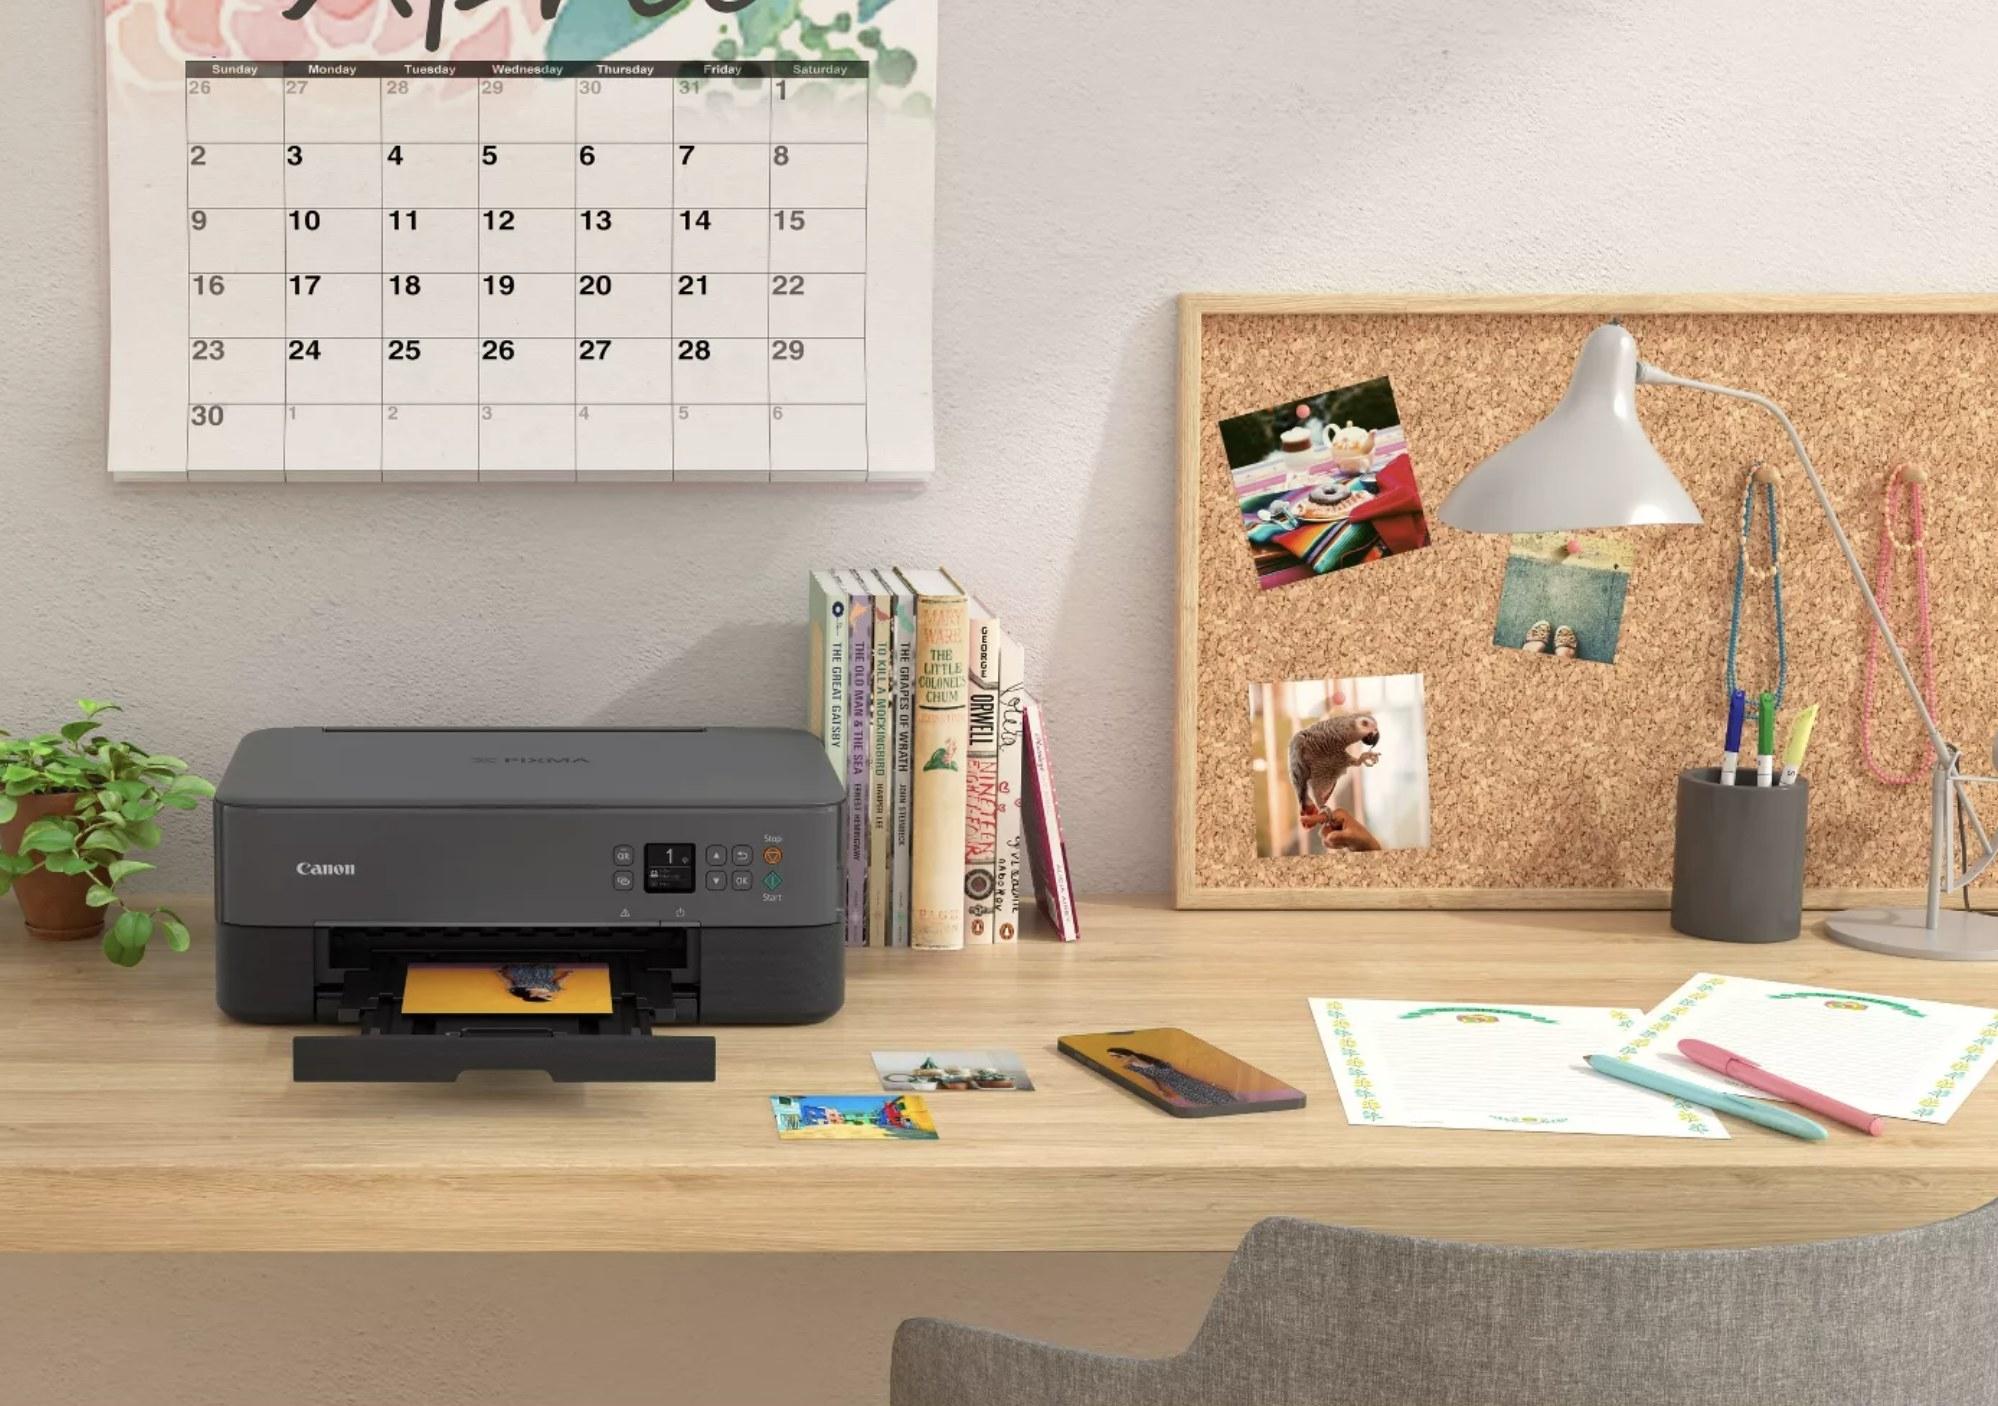 A black printer printing out a photograph